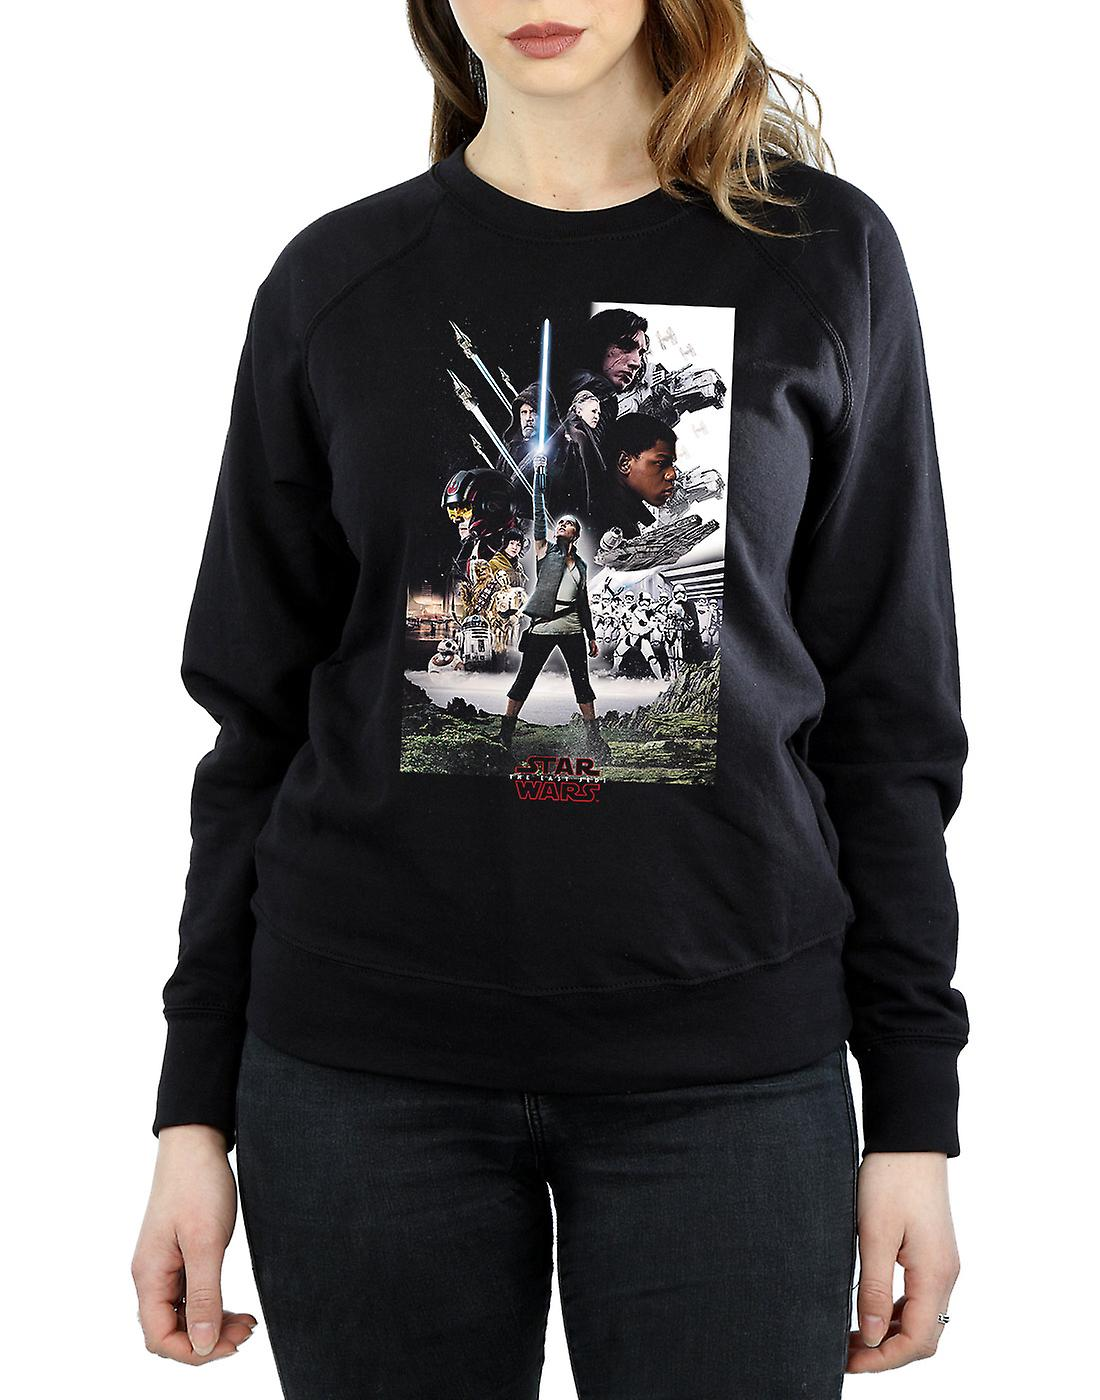 Star Wars Women's The Last Jedi Character Poster Sweatshirt